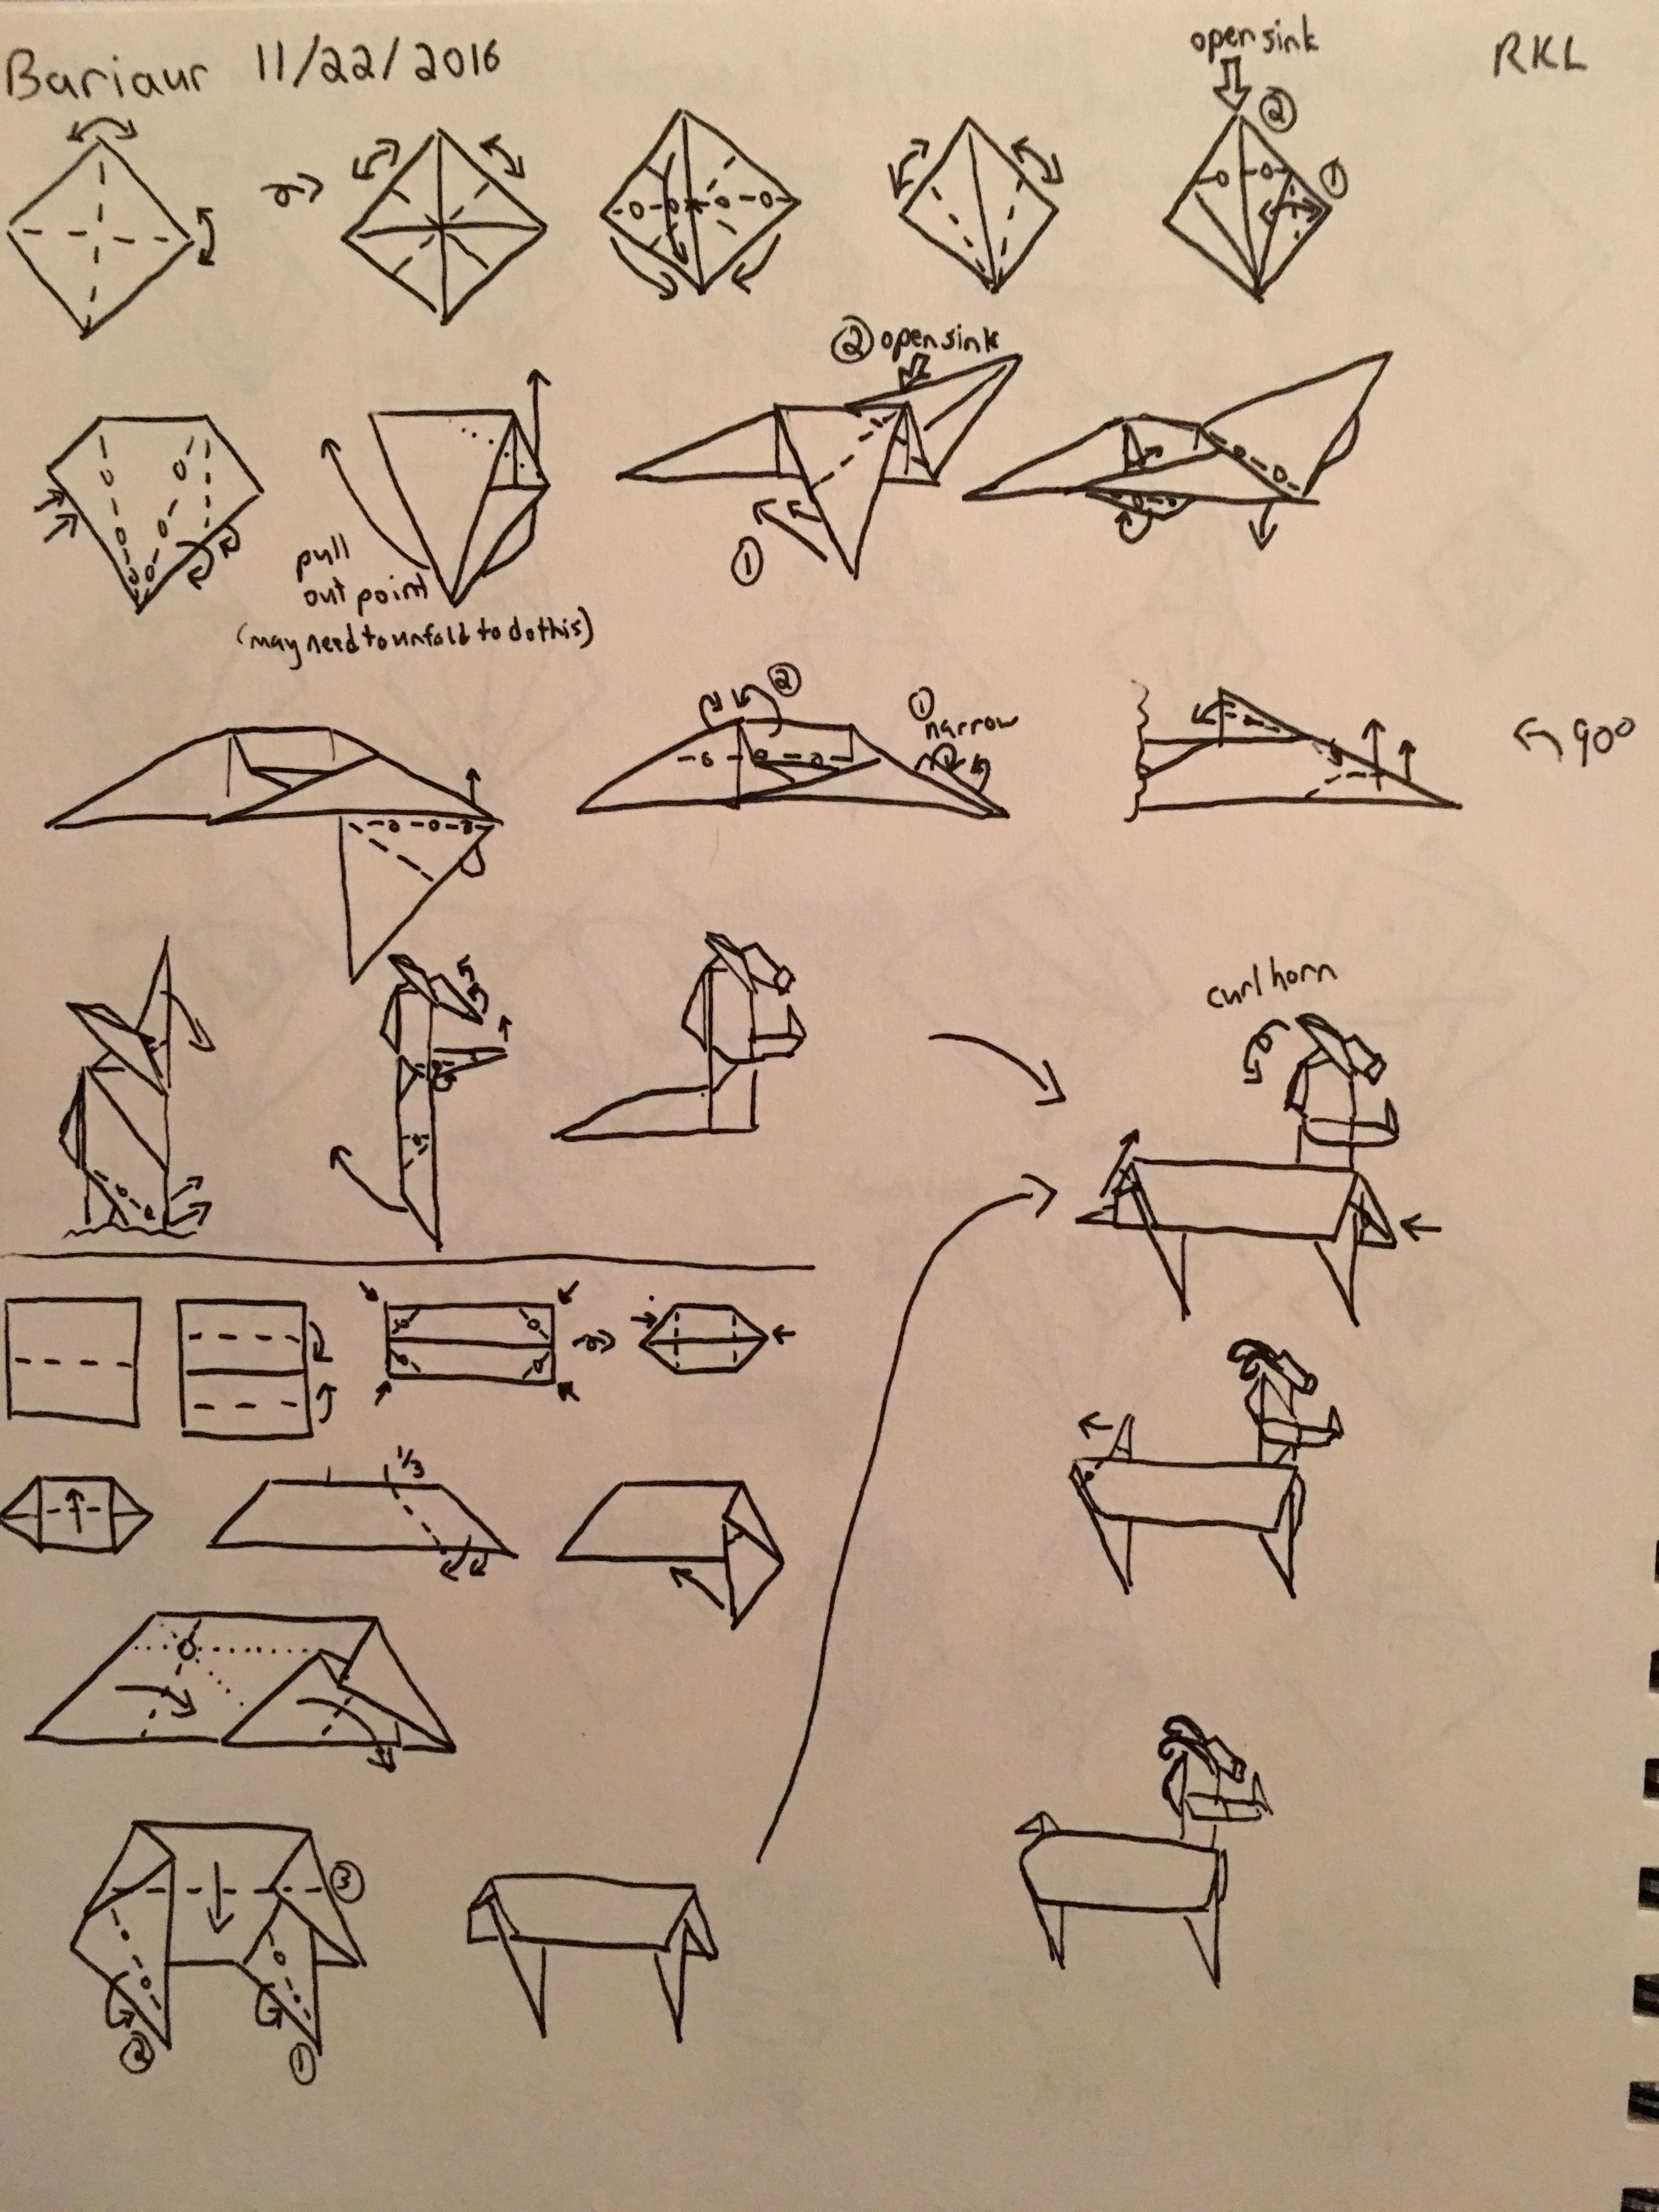 Bariaur Diagrams